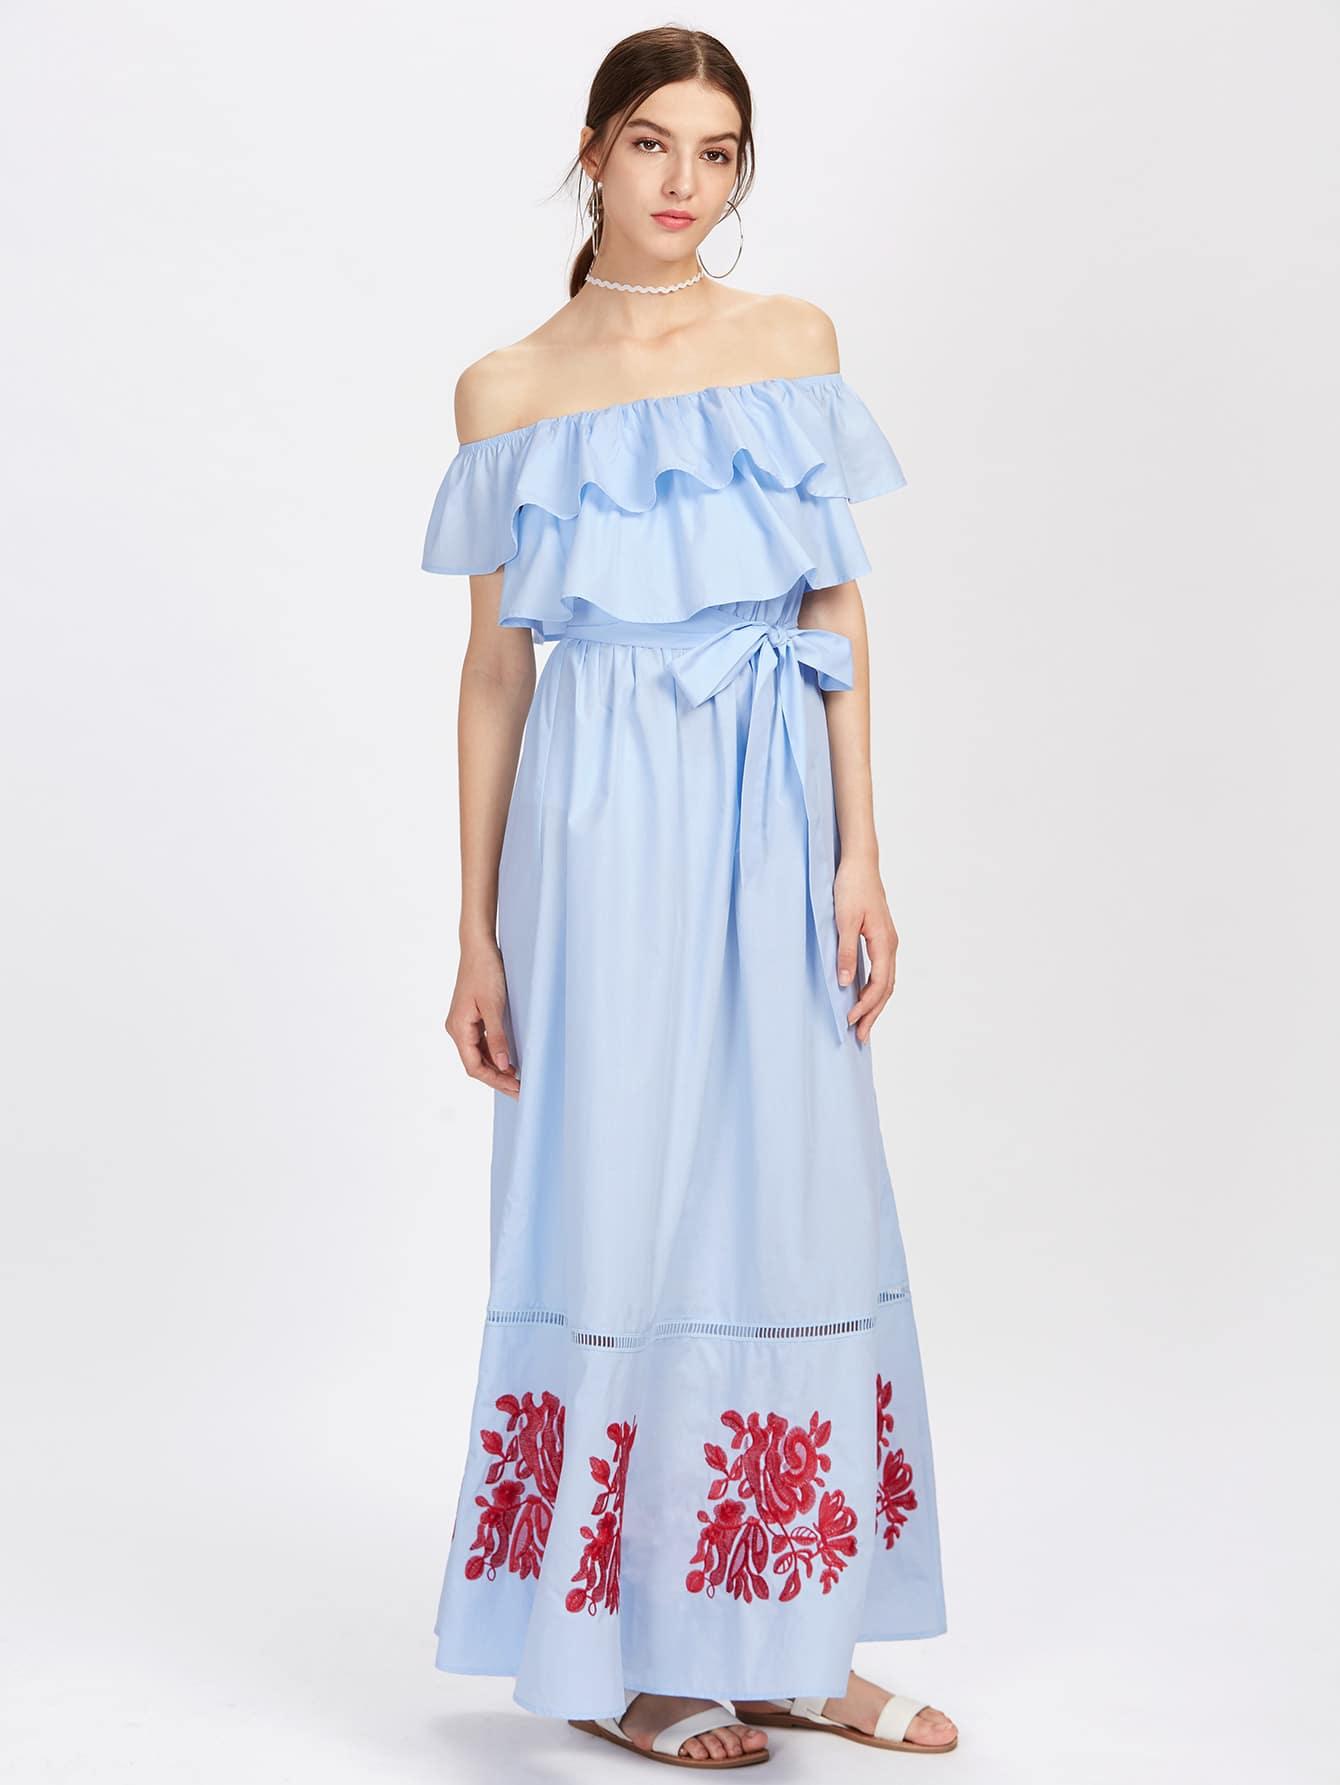 цена Lace Insert Embroidered Layered Frill Bardot Dress онлайн в 2017 году